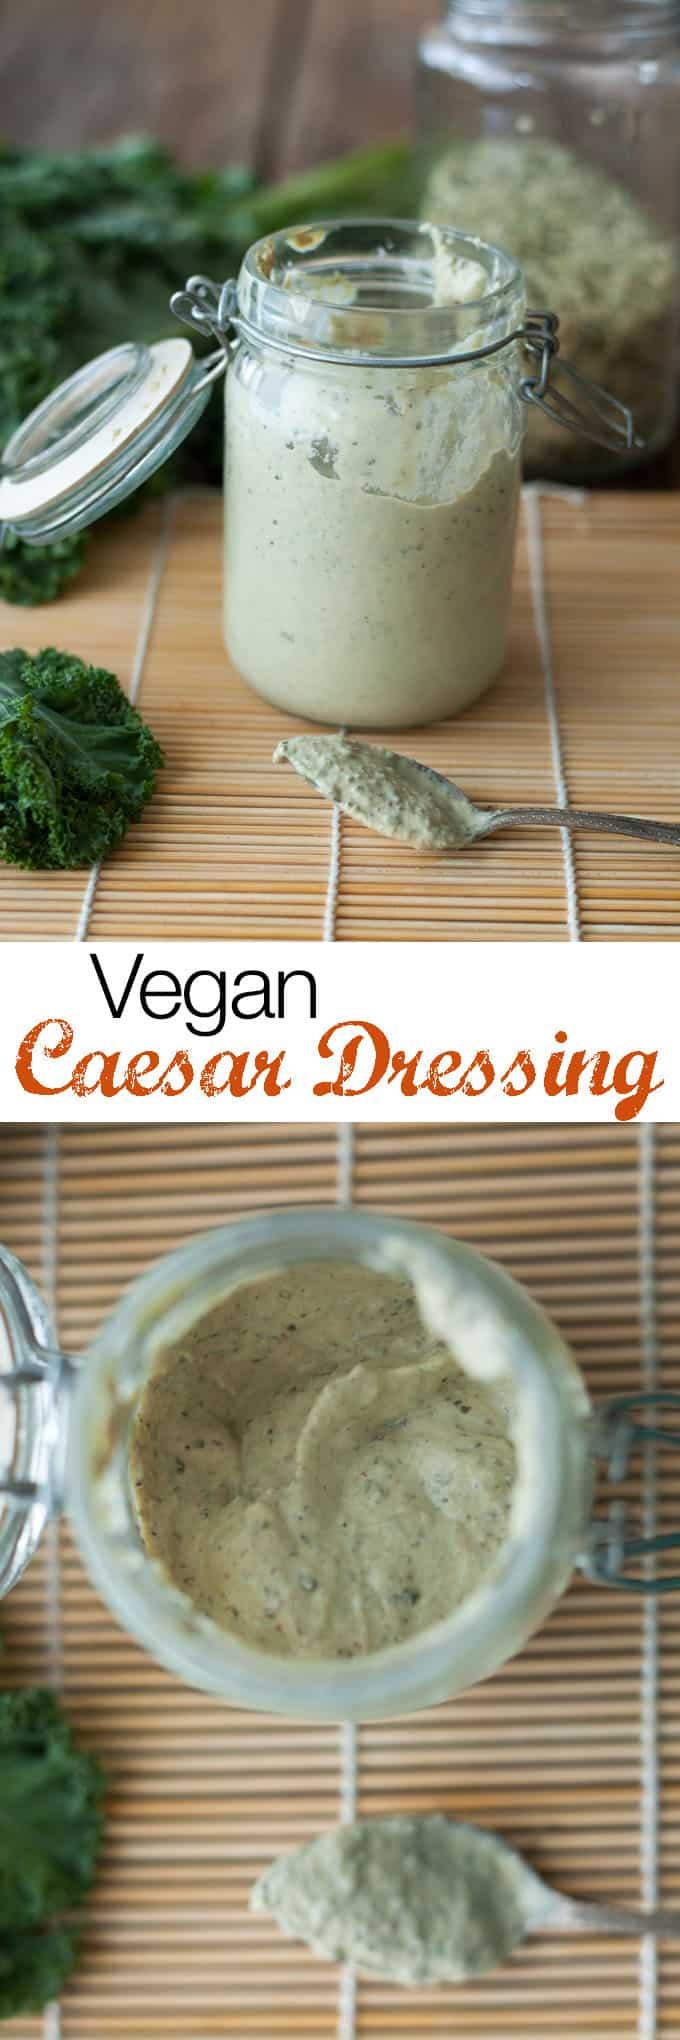 vegan Caesar Dressing recipe